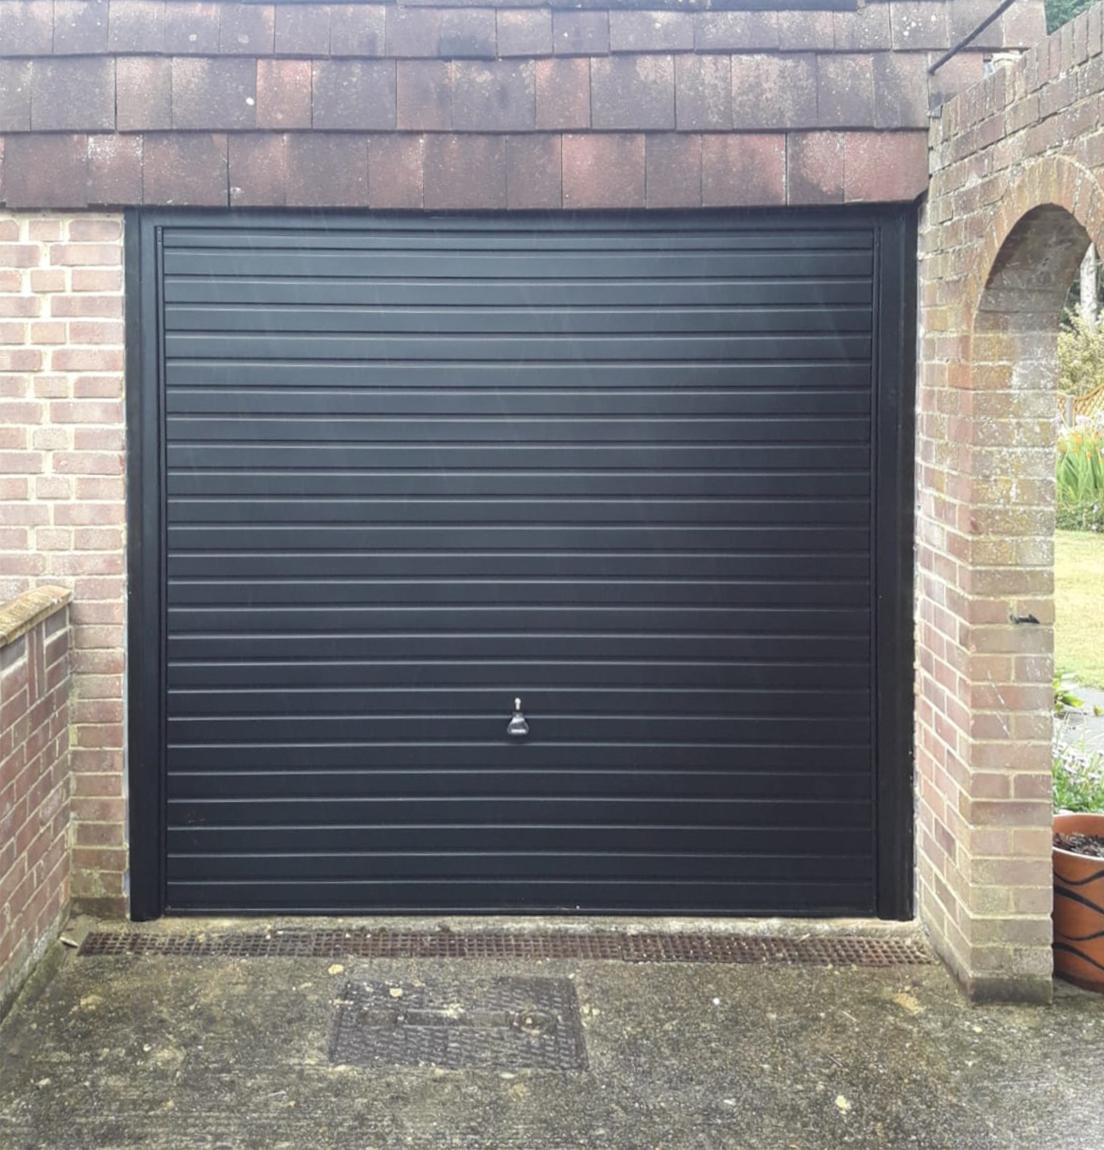 Garador Steel Up & Over Garage Door Finished in Black